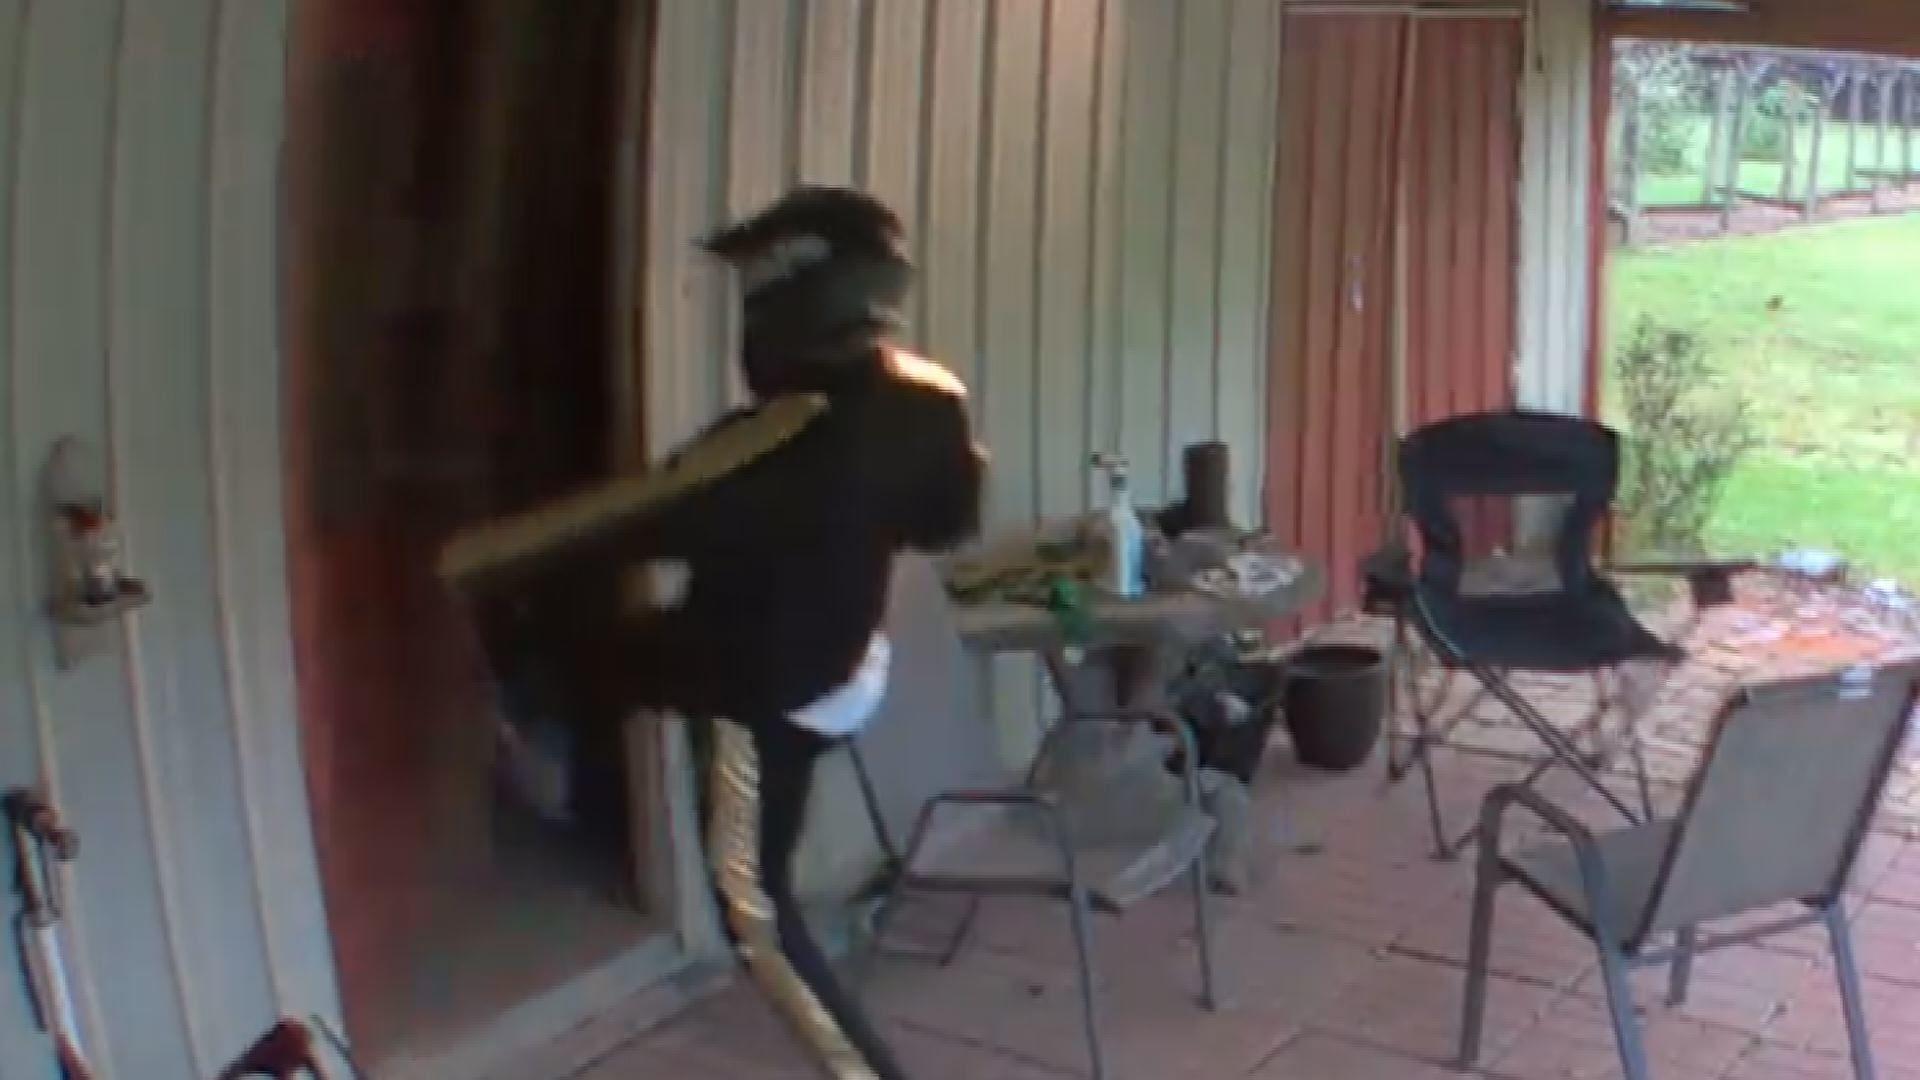 VIDEO___Grand_Bay_crime_caught_on_camera_0_20190406121233